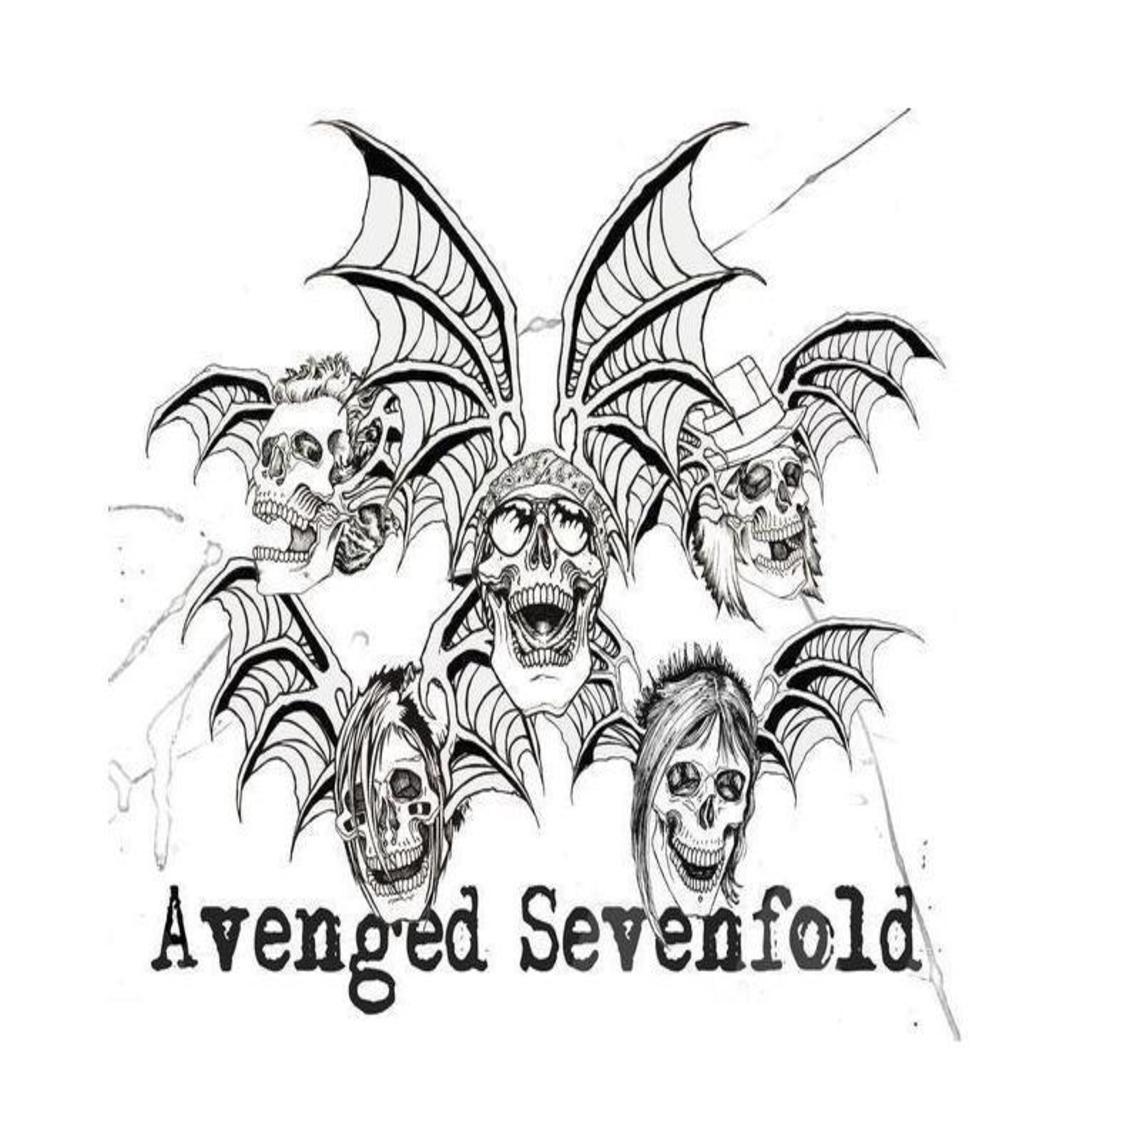 1140x1140 Avenged Sevenfold Members